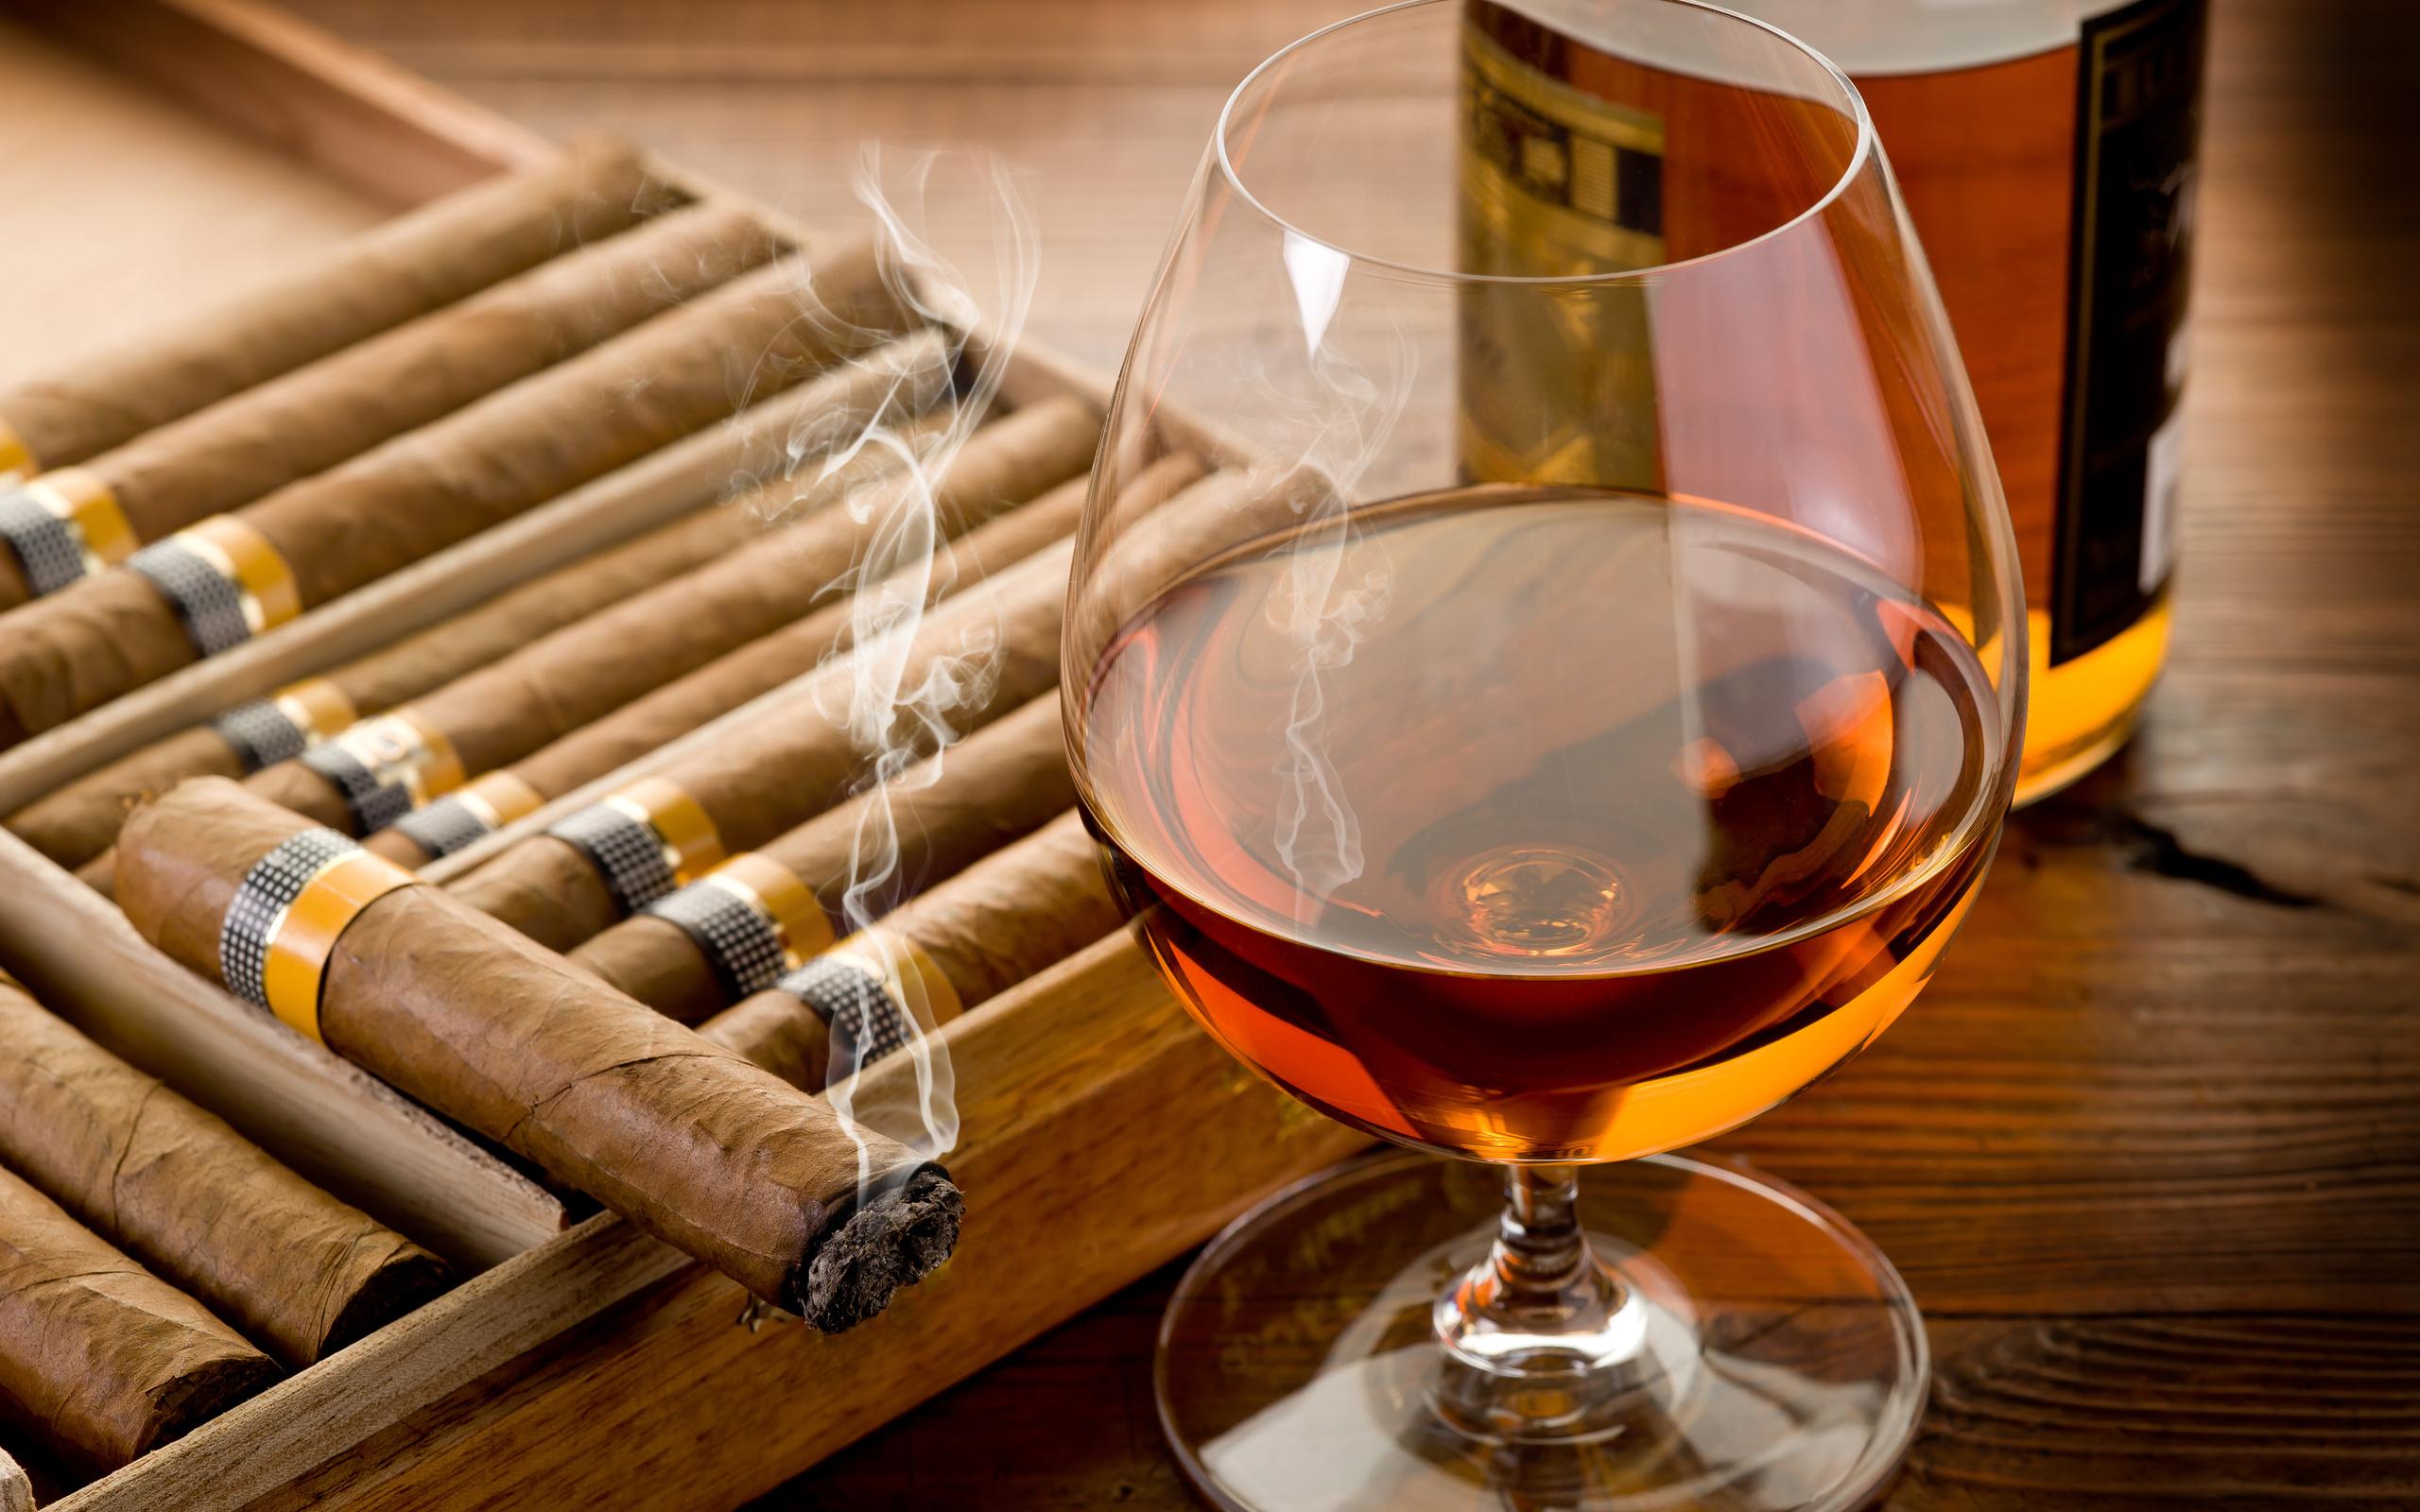 Liquor: Alcohol, Стекло, Напиток, Liquor, Cigar